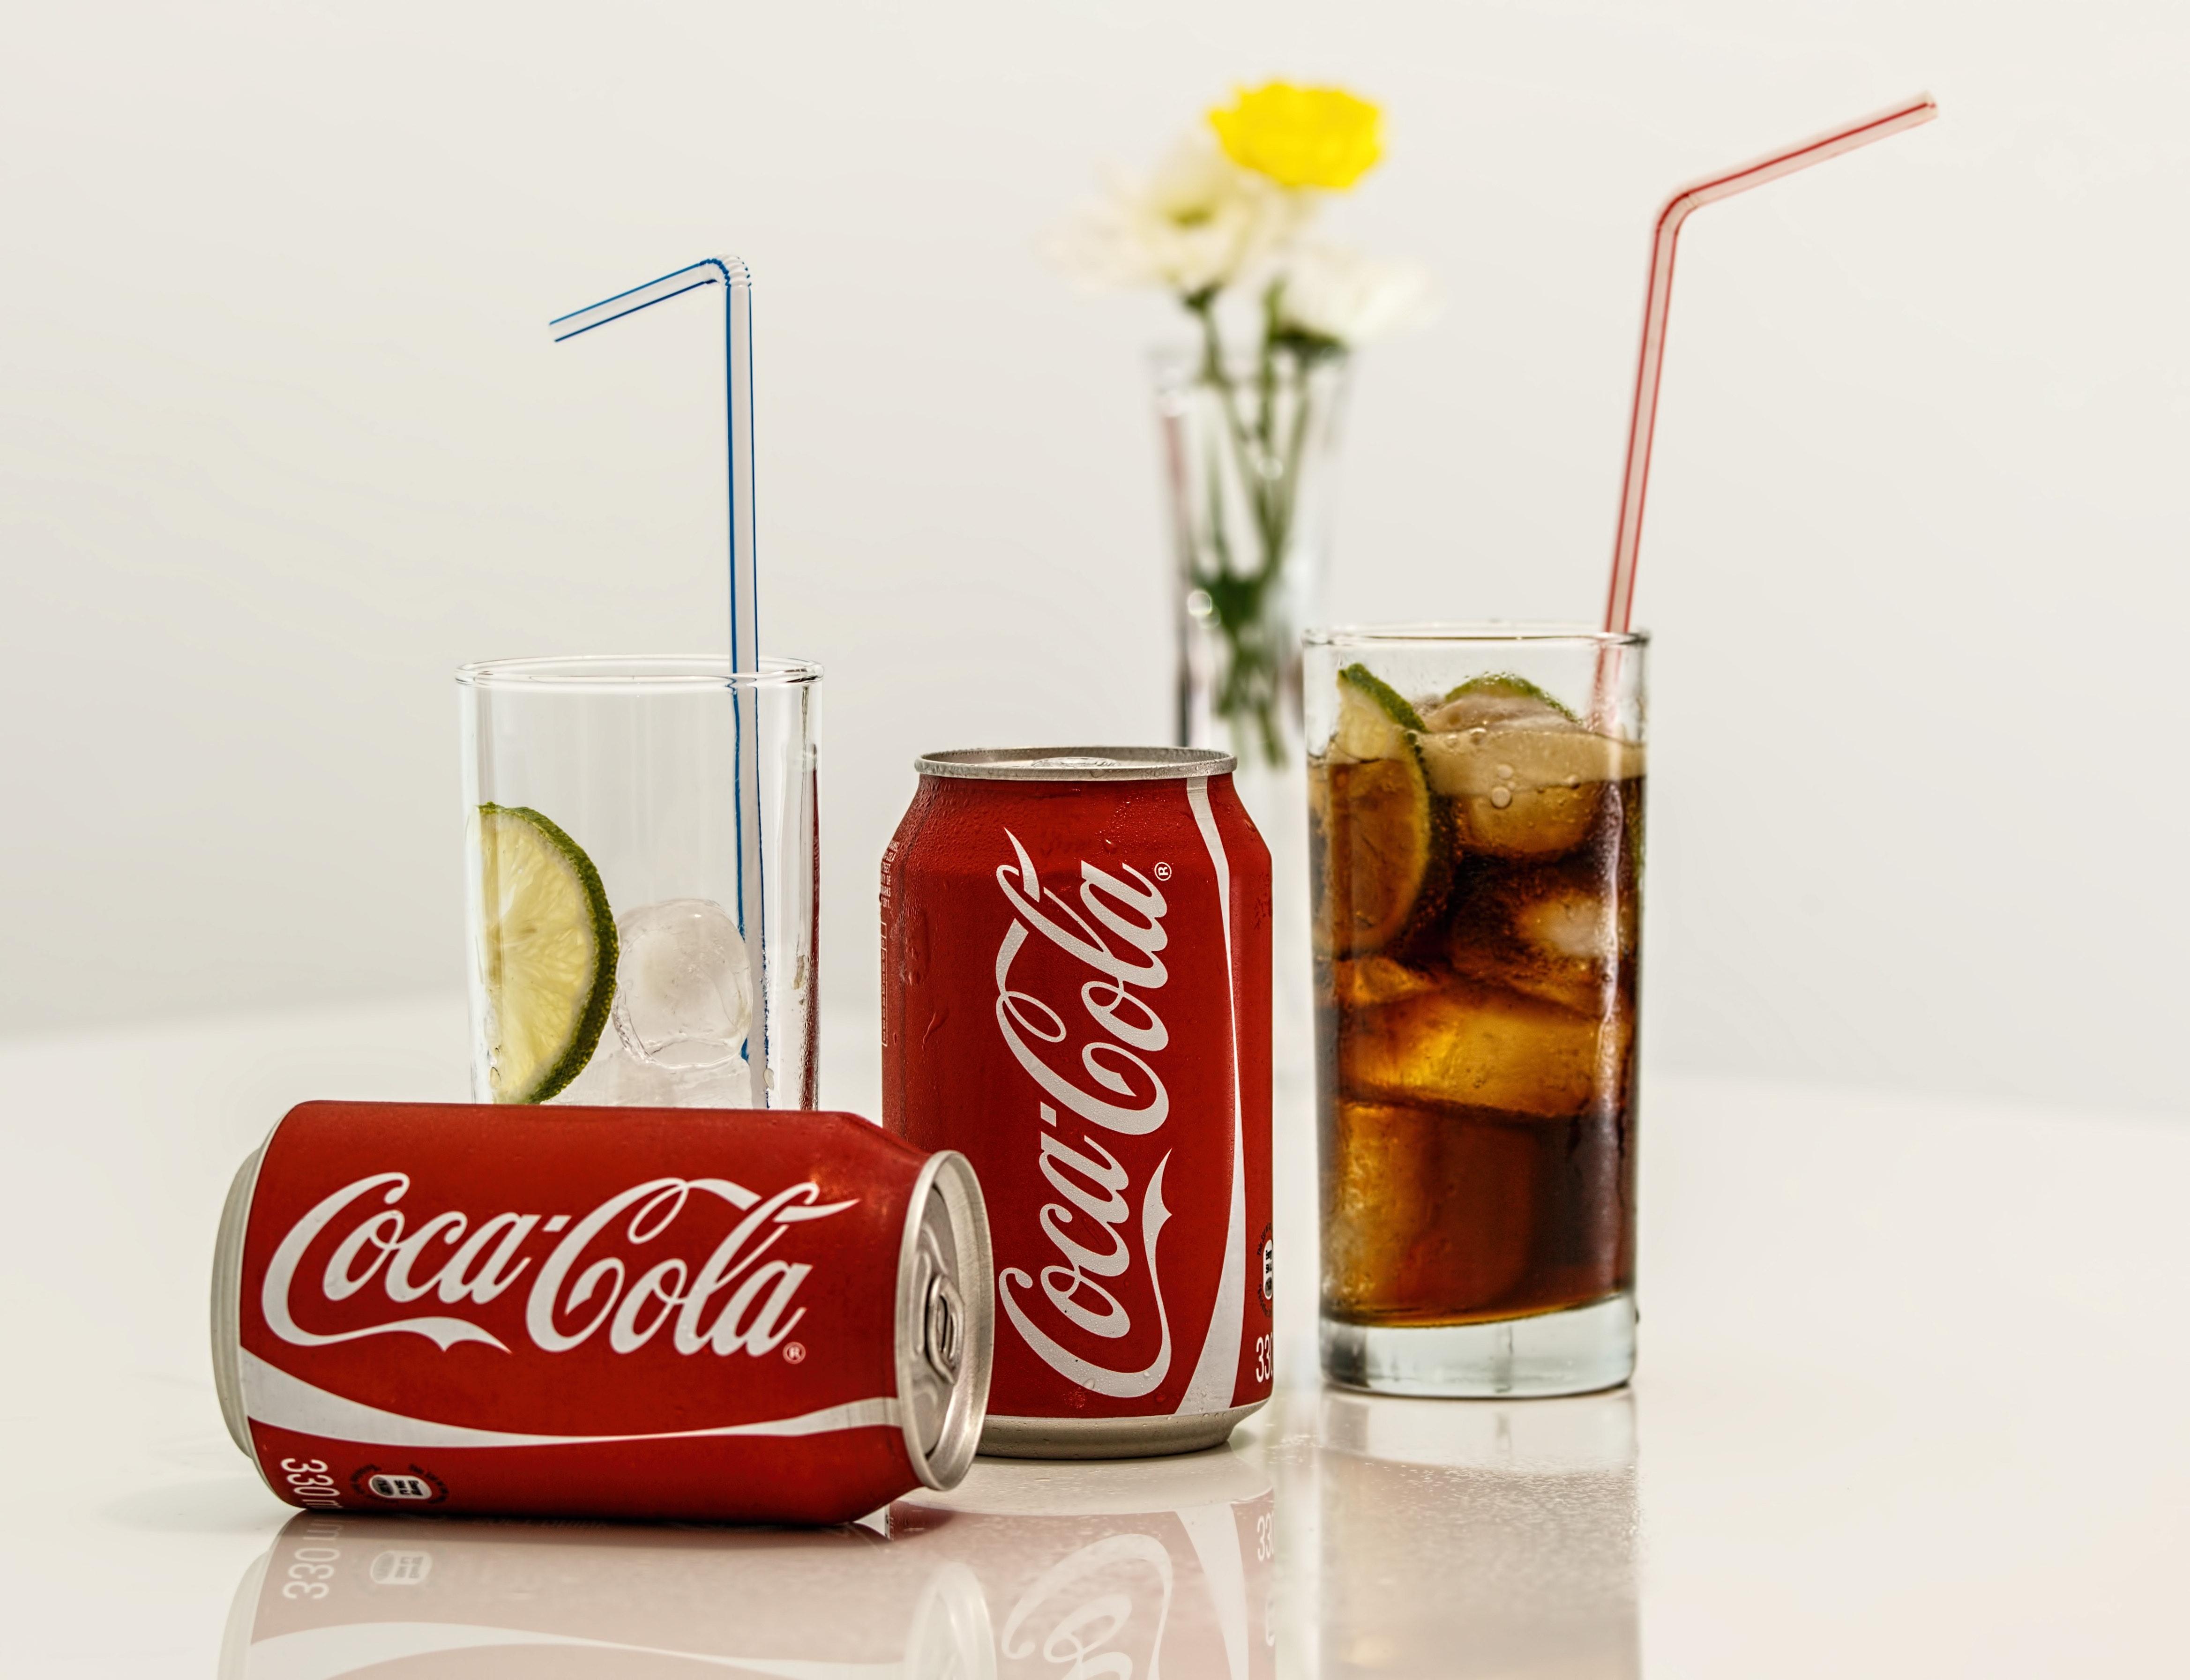 1000+ Kalte Getränke Fotos · Pexels · Kostenlose Stock Fotos